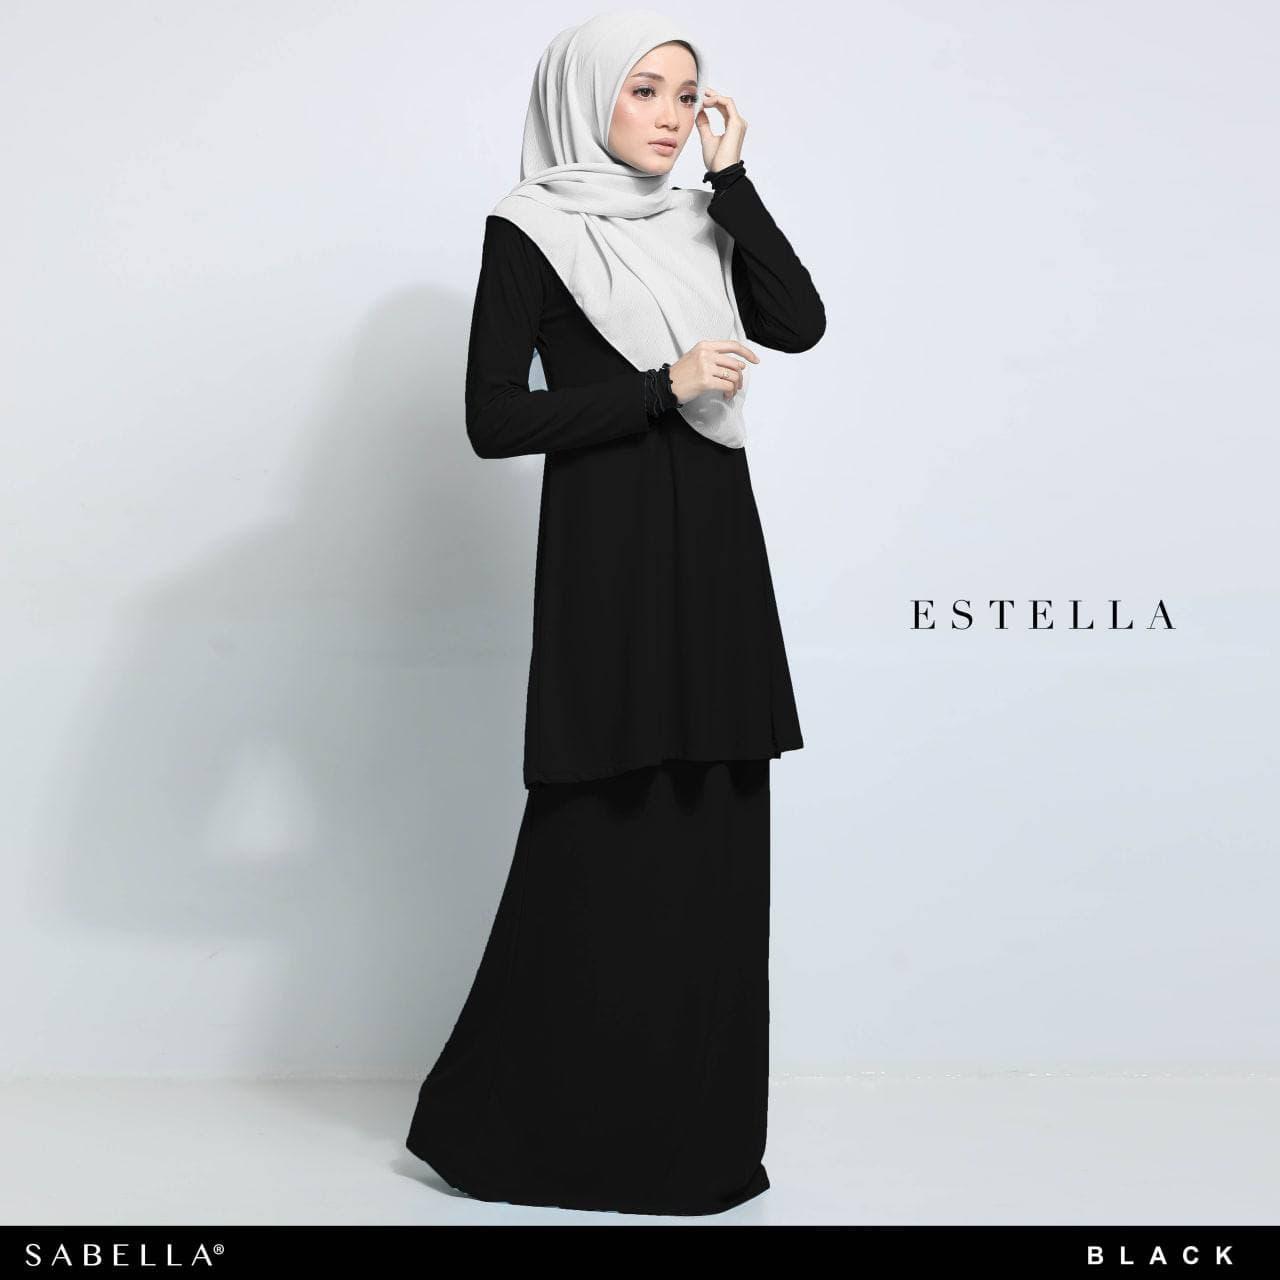 Estella 2.0 Black